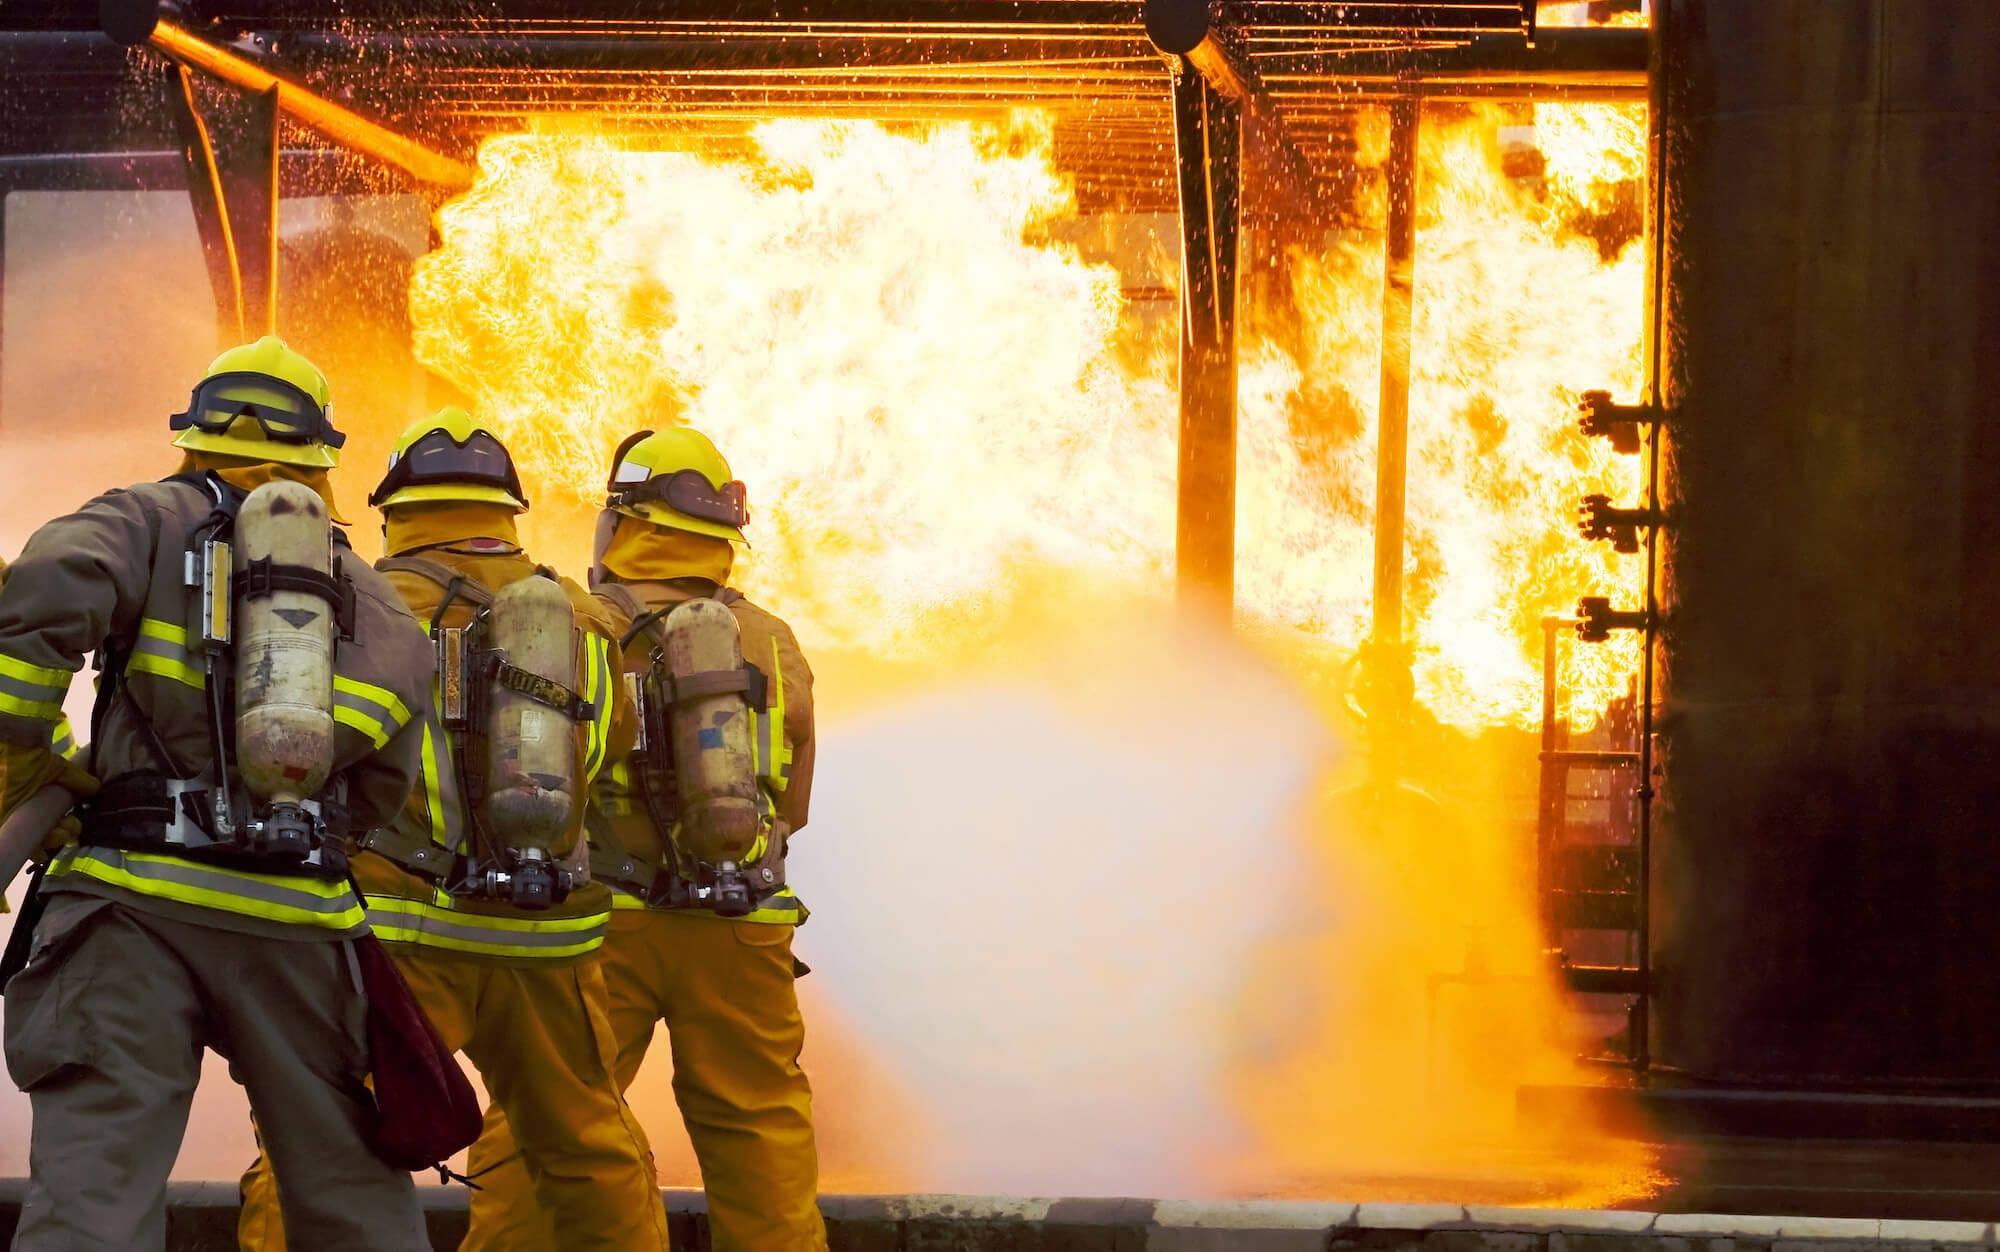 Firefighter | Pocket Prep